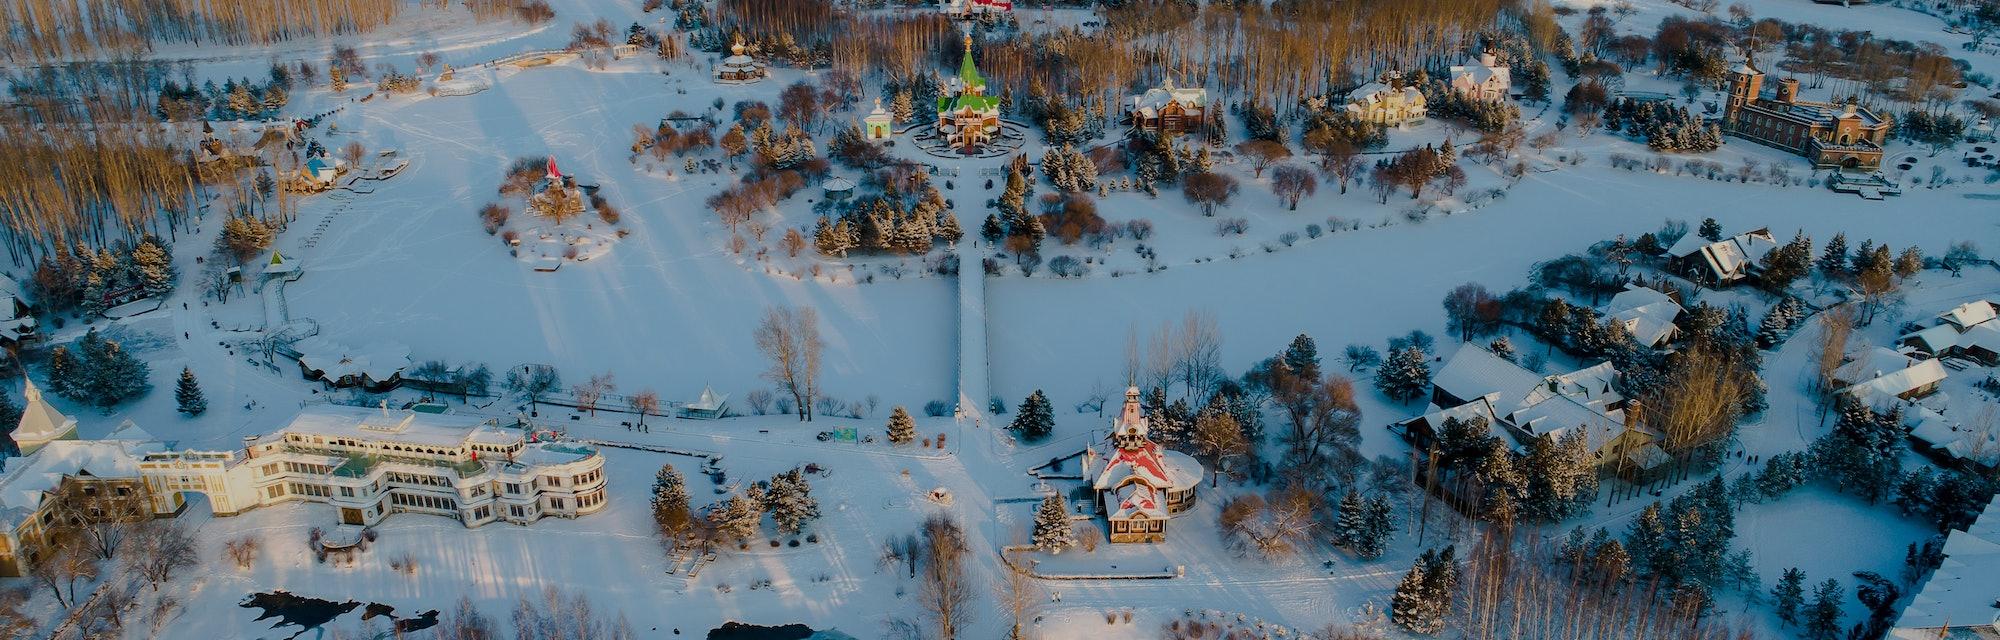 HARBIN, CHINA - DECEMBER 18, 2019 - The city of Harbin after a heavy snow, Harbin, Heilongjiang Prov...